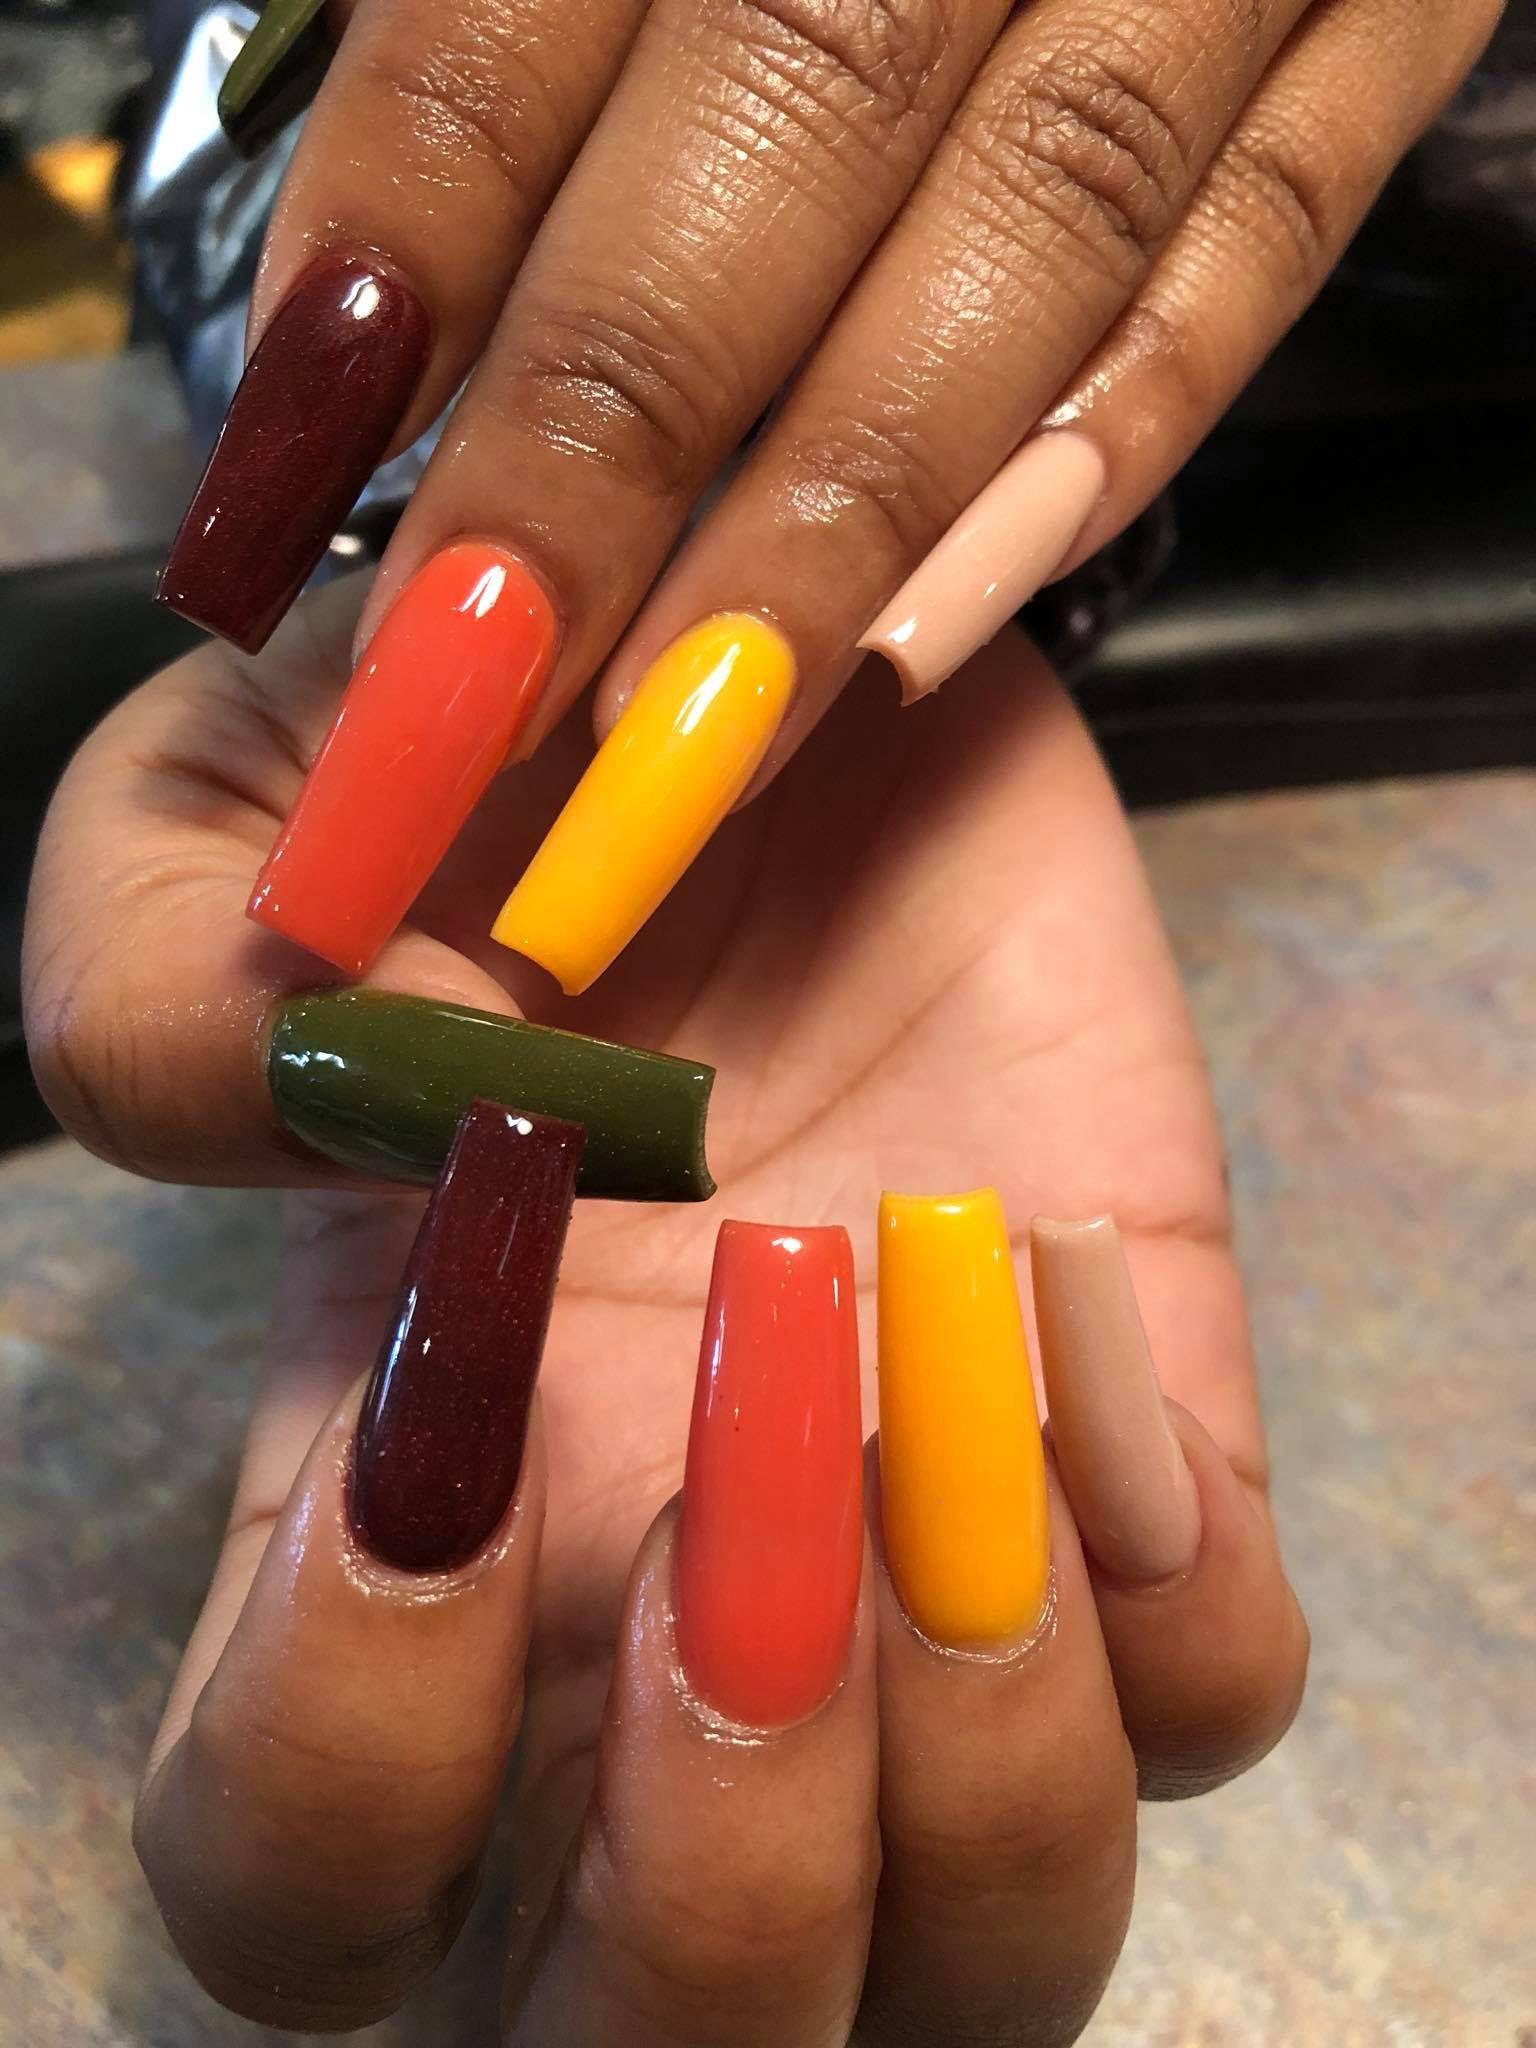 E8e2f98fe055f6a240dae512f2480cdb Jpg 736 702 Pixeles Fall Acrylic Nails Luxury Nails Orange Nails